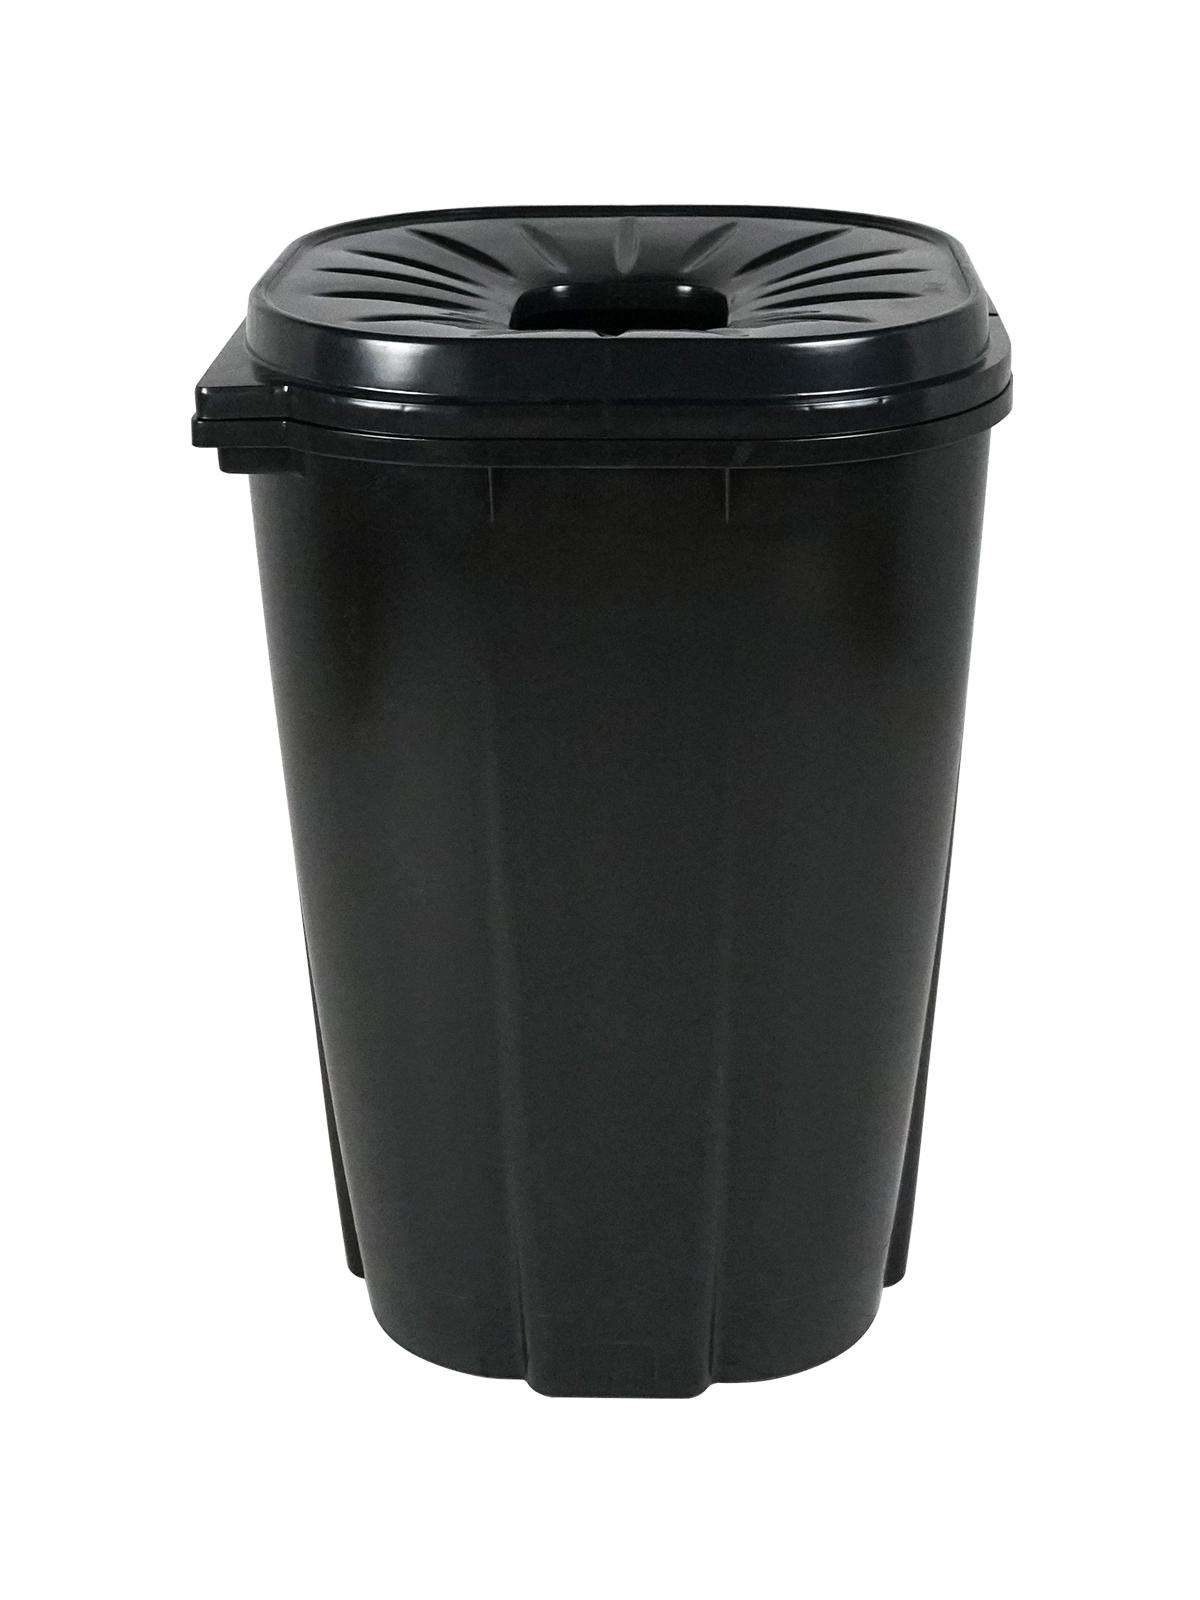 55 GALLON - Single - Unit - Waste Bin - Circle - Black